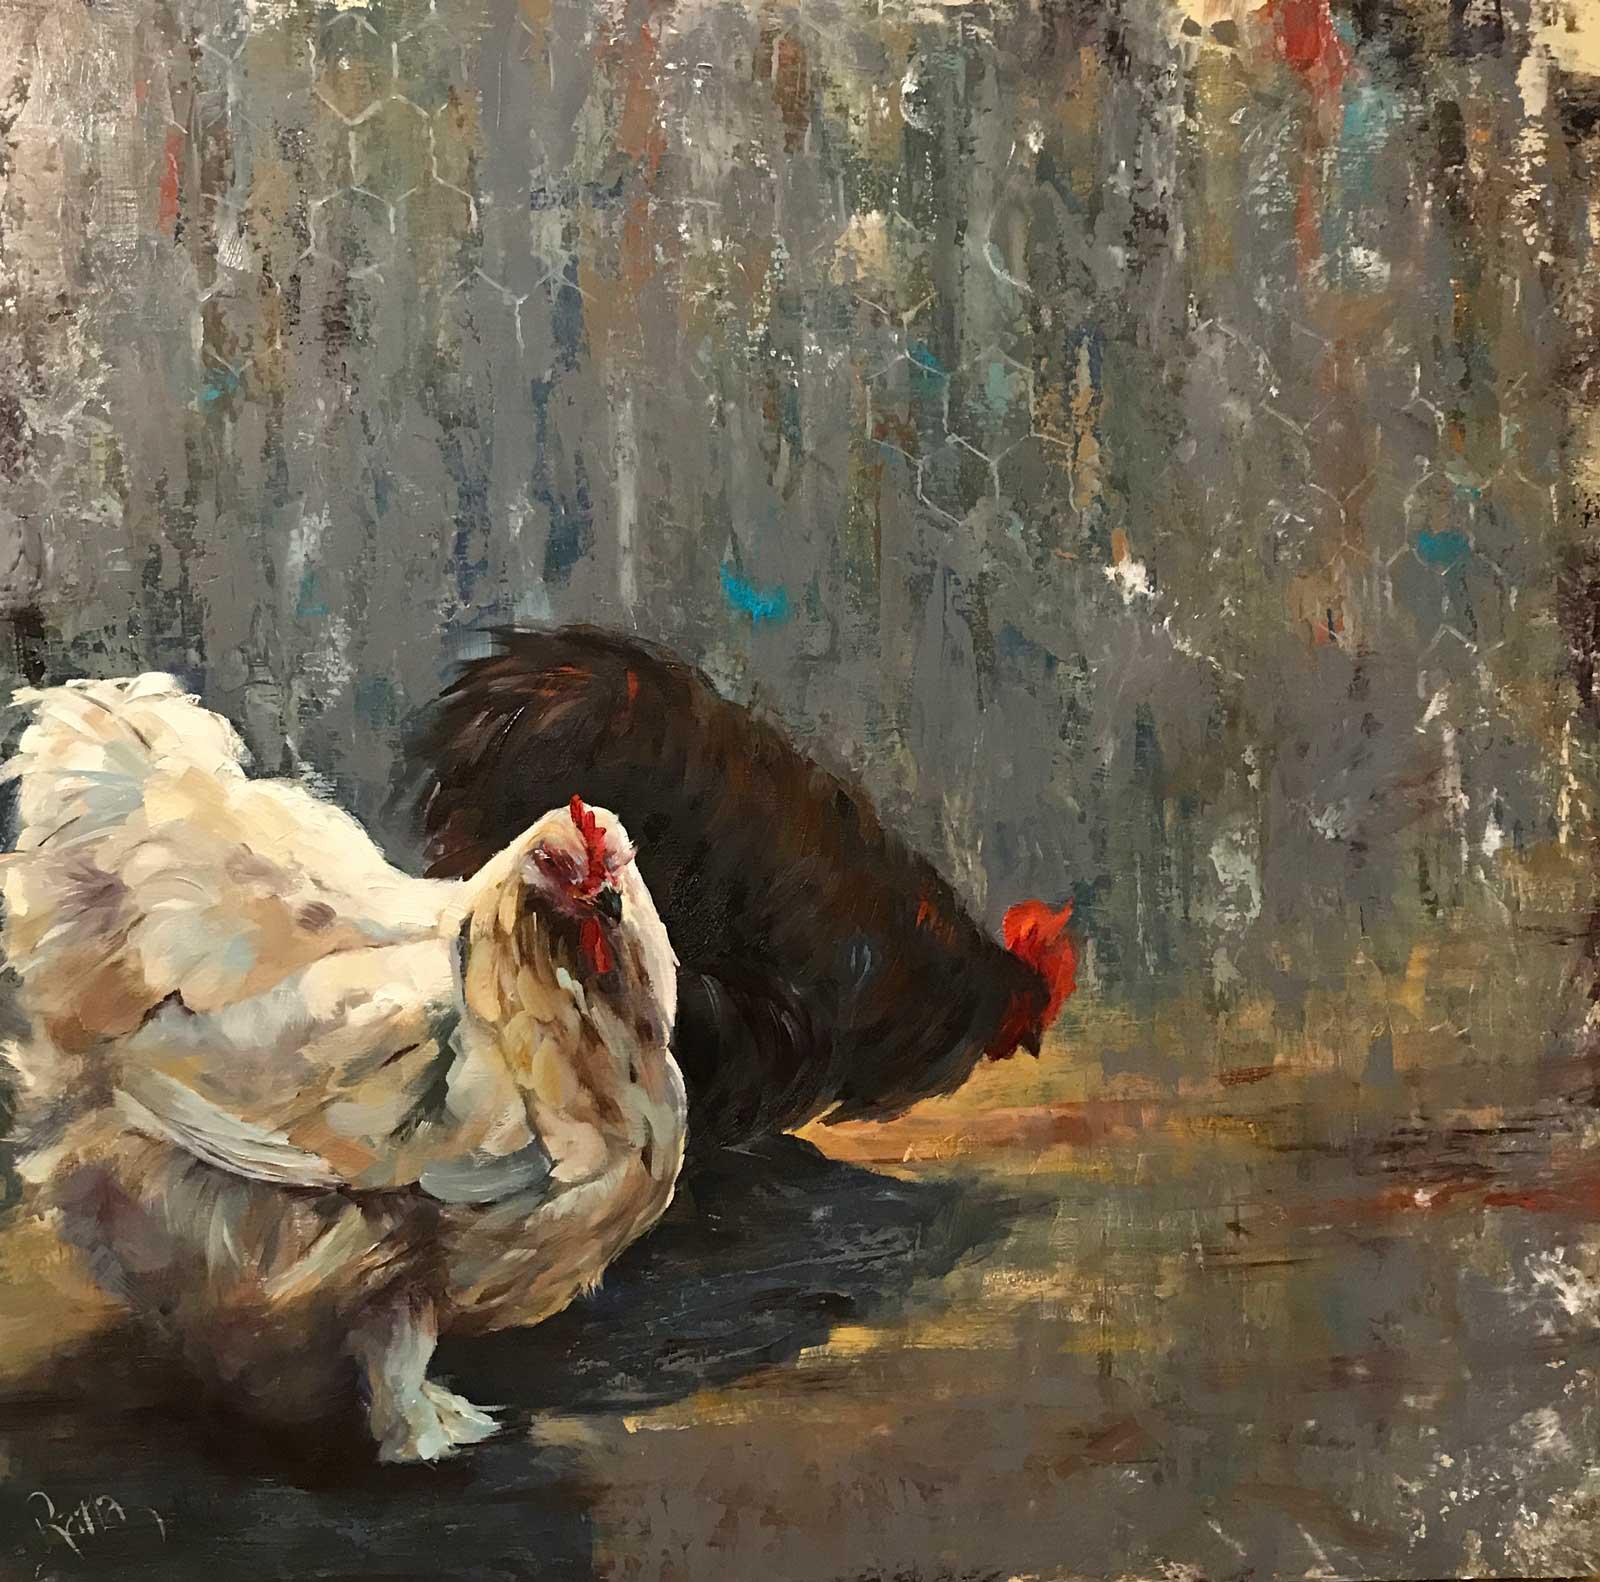 Rana Jordahl, Feathered Friends, 24x24 Oil on board